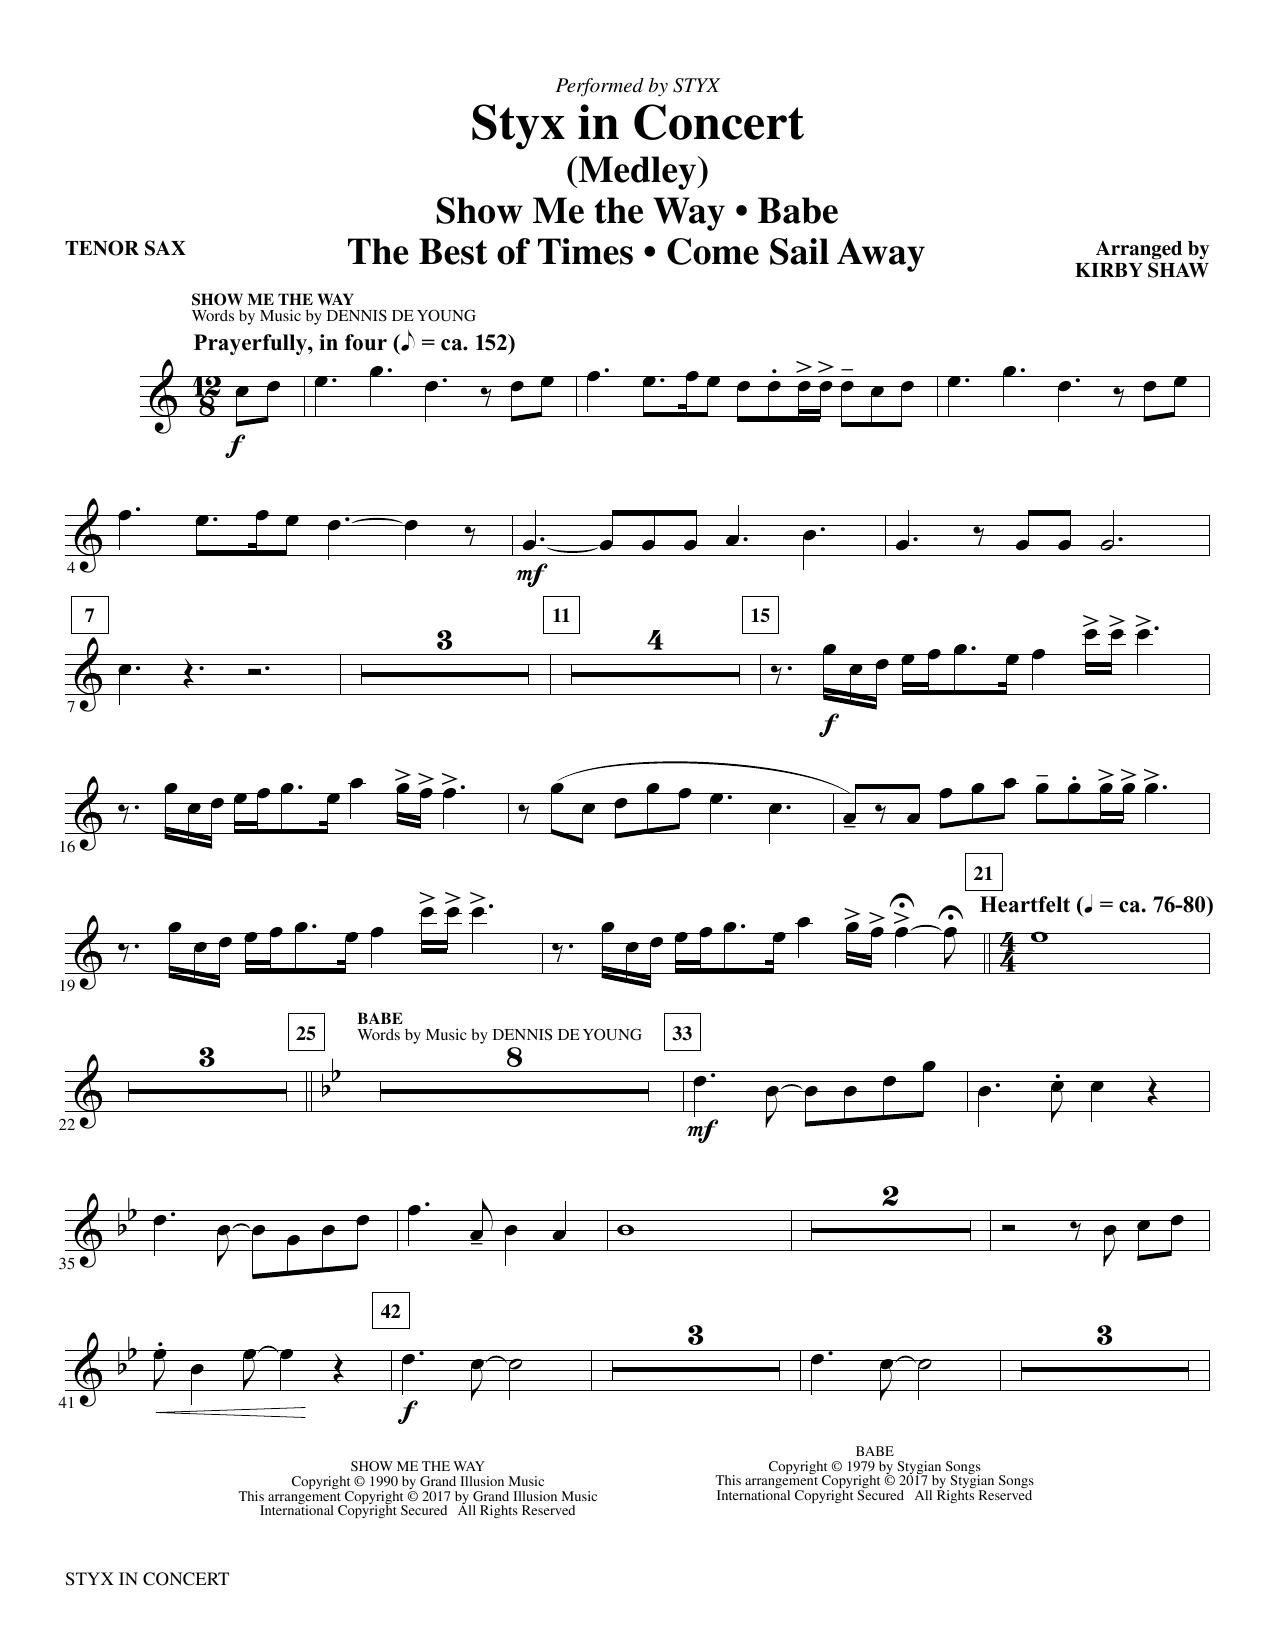 Sheet Music Digital Files To Print Licensed Dennis Deyoung Digital